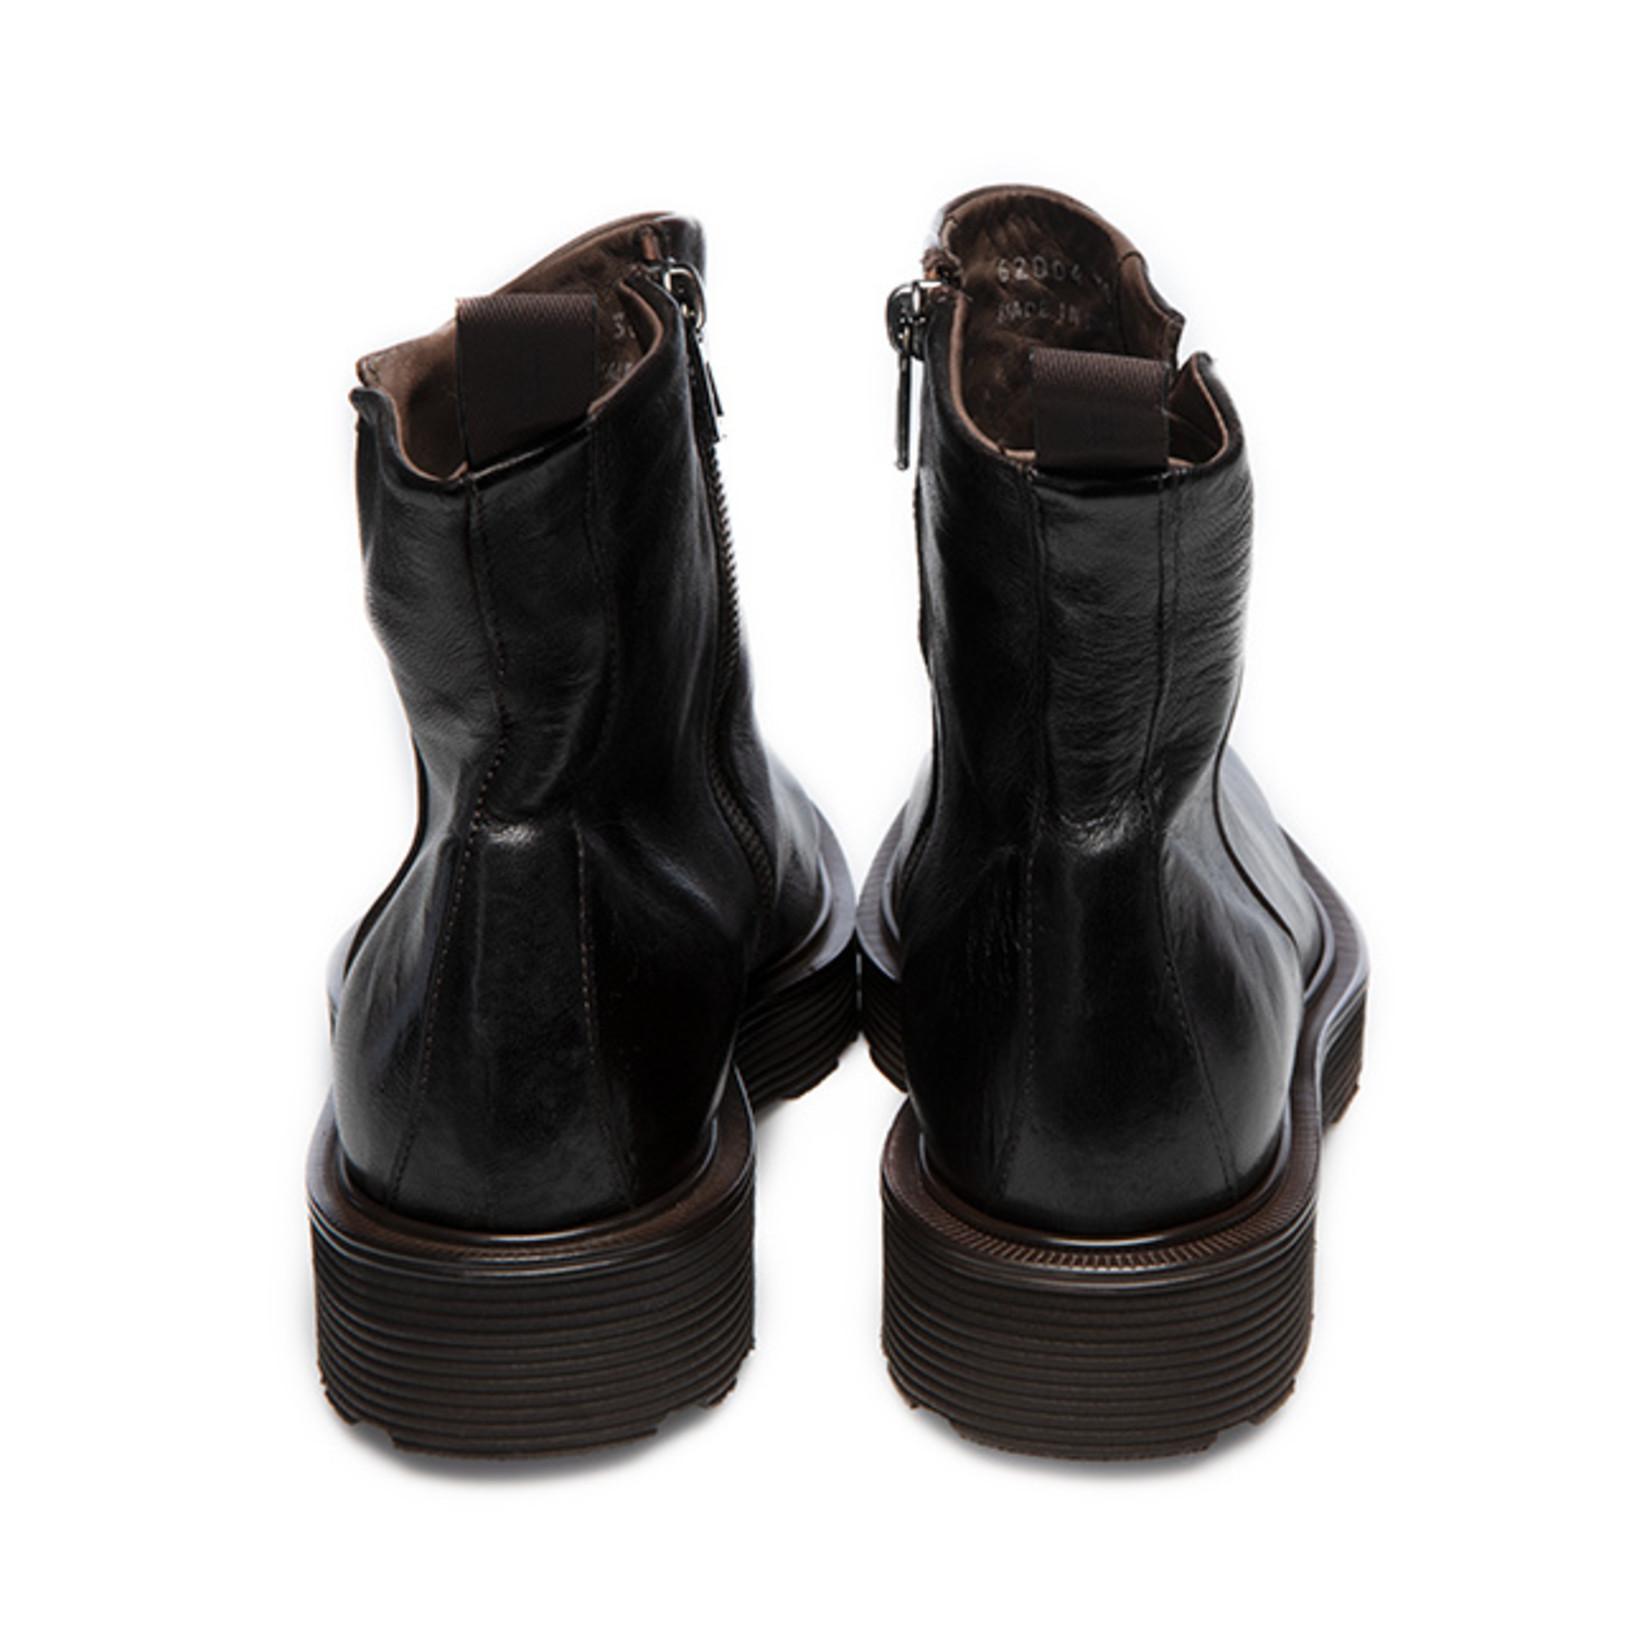 Sturlini Chelsea boot